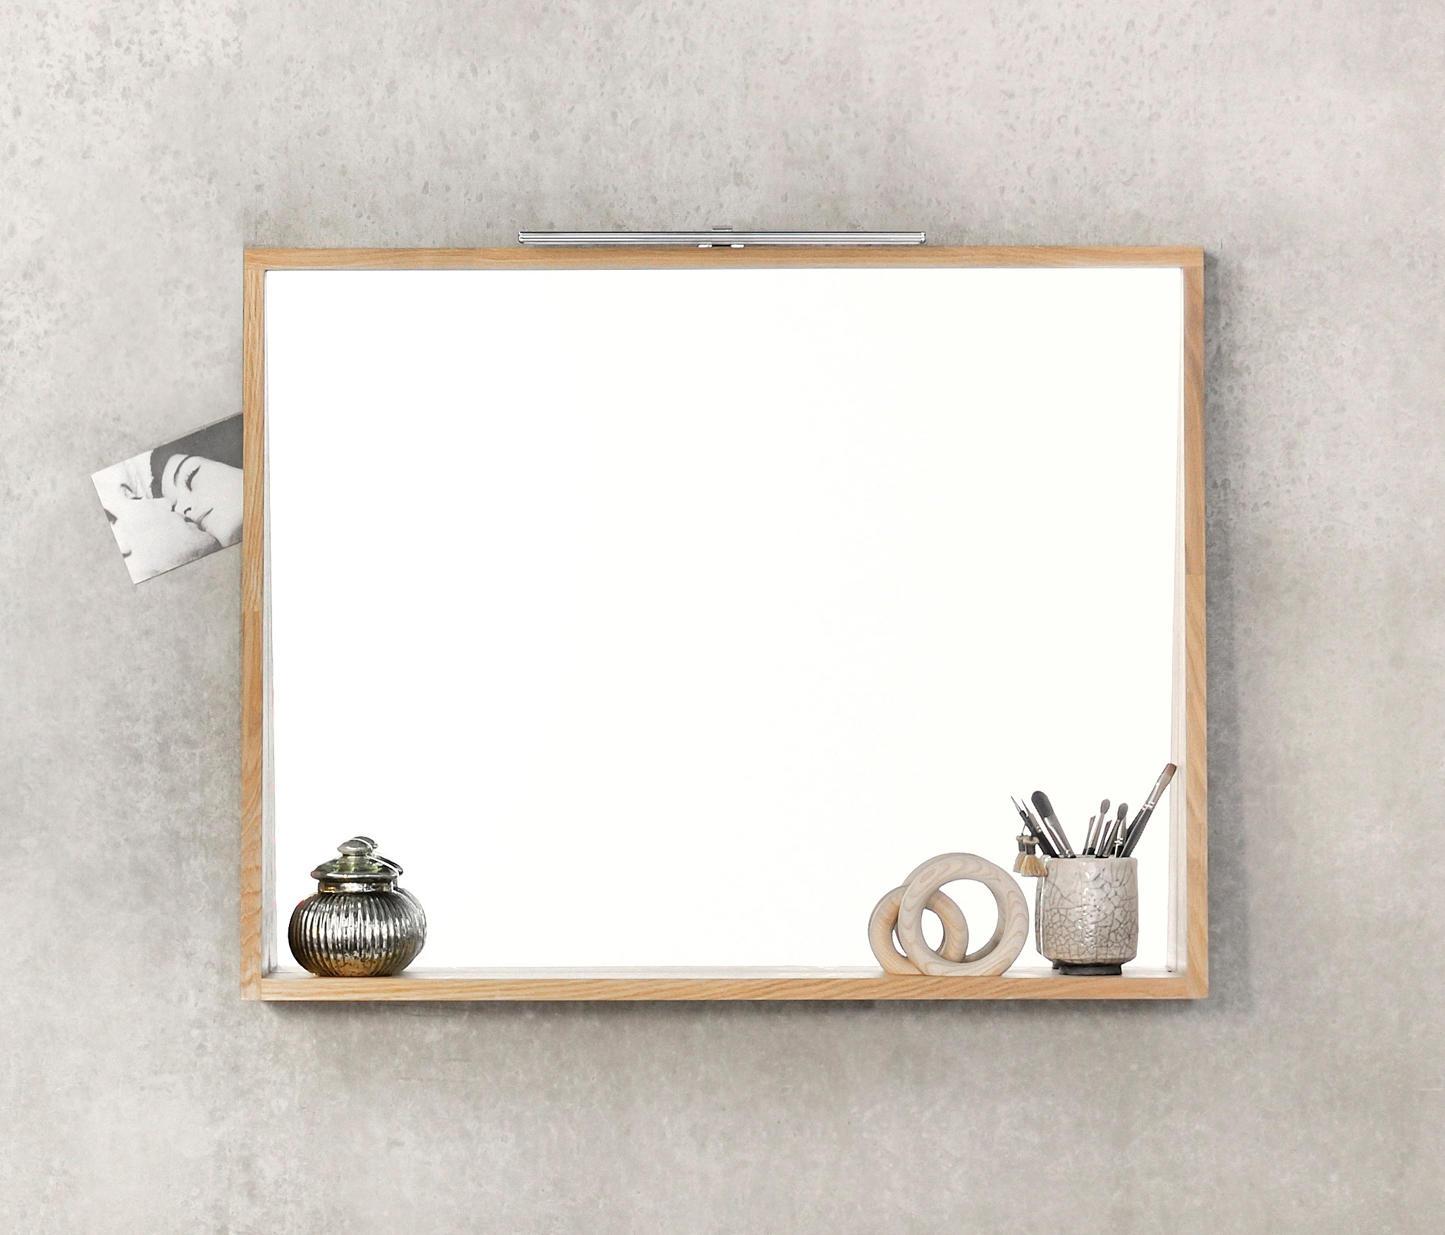 Bathroom Mirror With Shelf Minimalist, Oak Framed Bathroom Mirror With Shelf